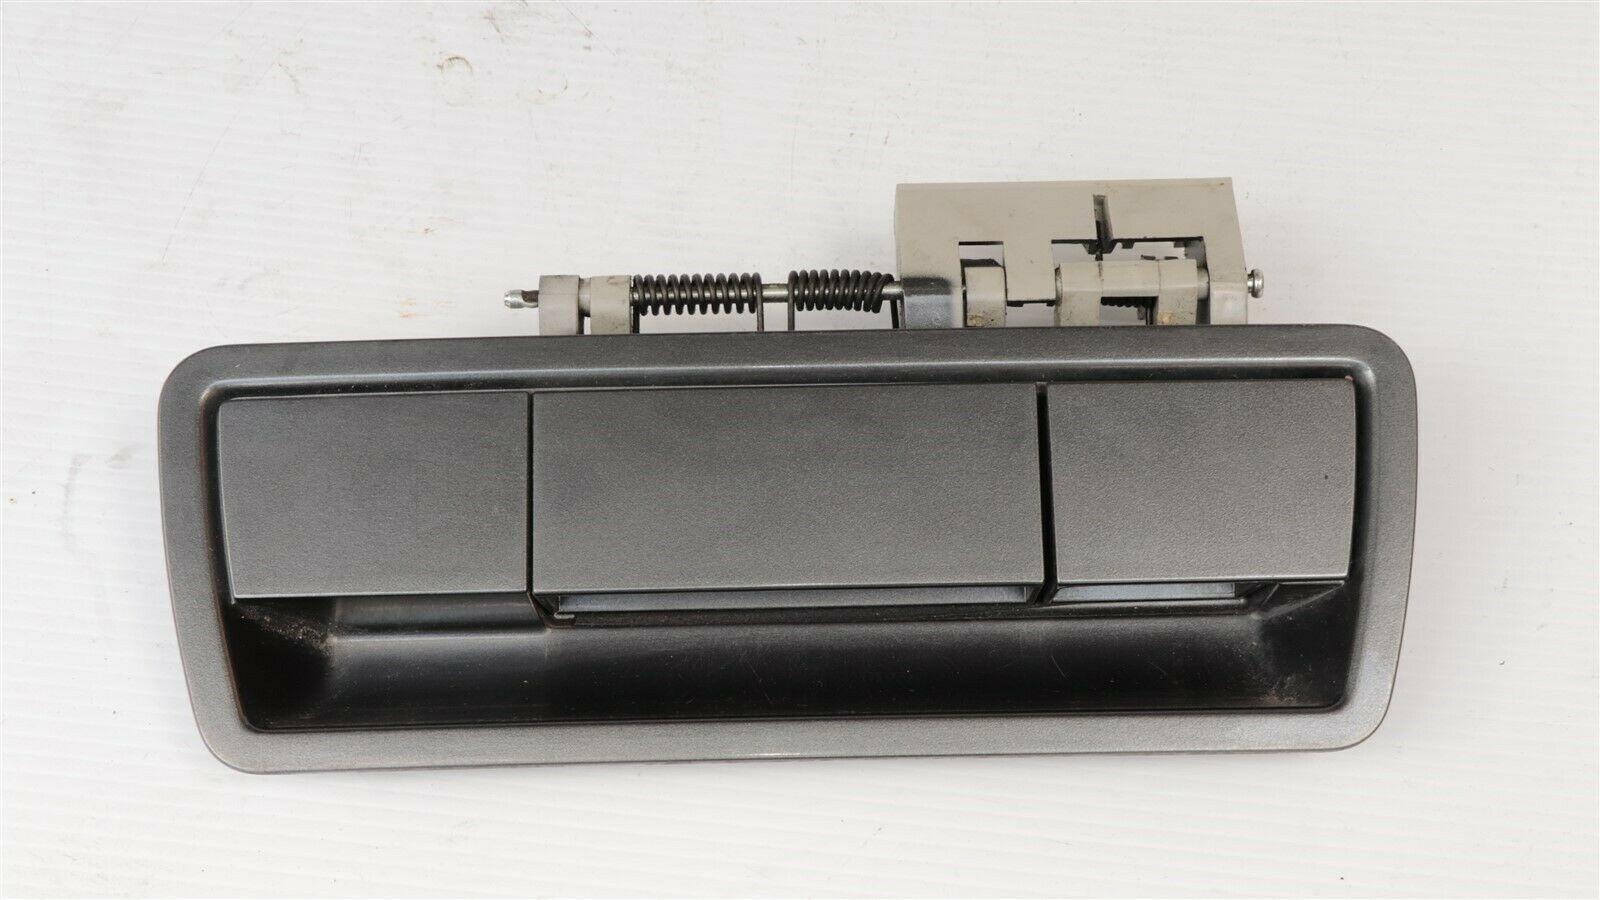 04-12 Nissan Armada Rear Hatch Tailgate Liftgate Trunk Exterior Door Handle K11